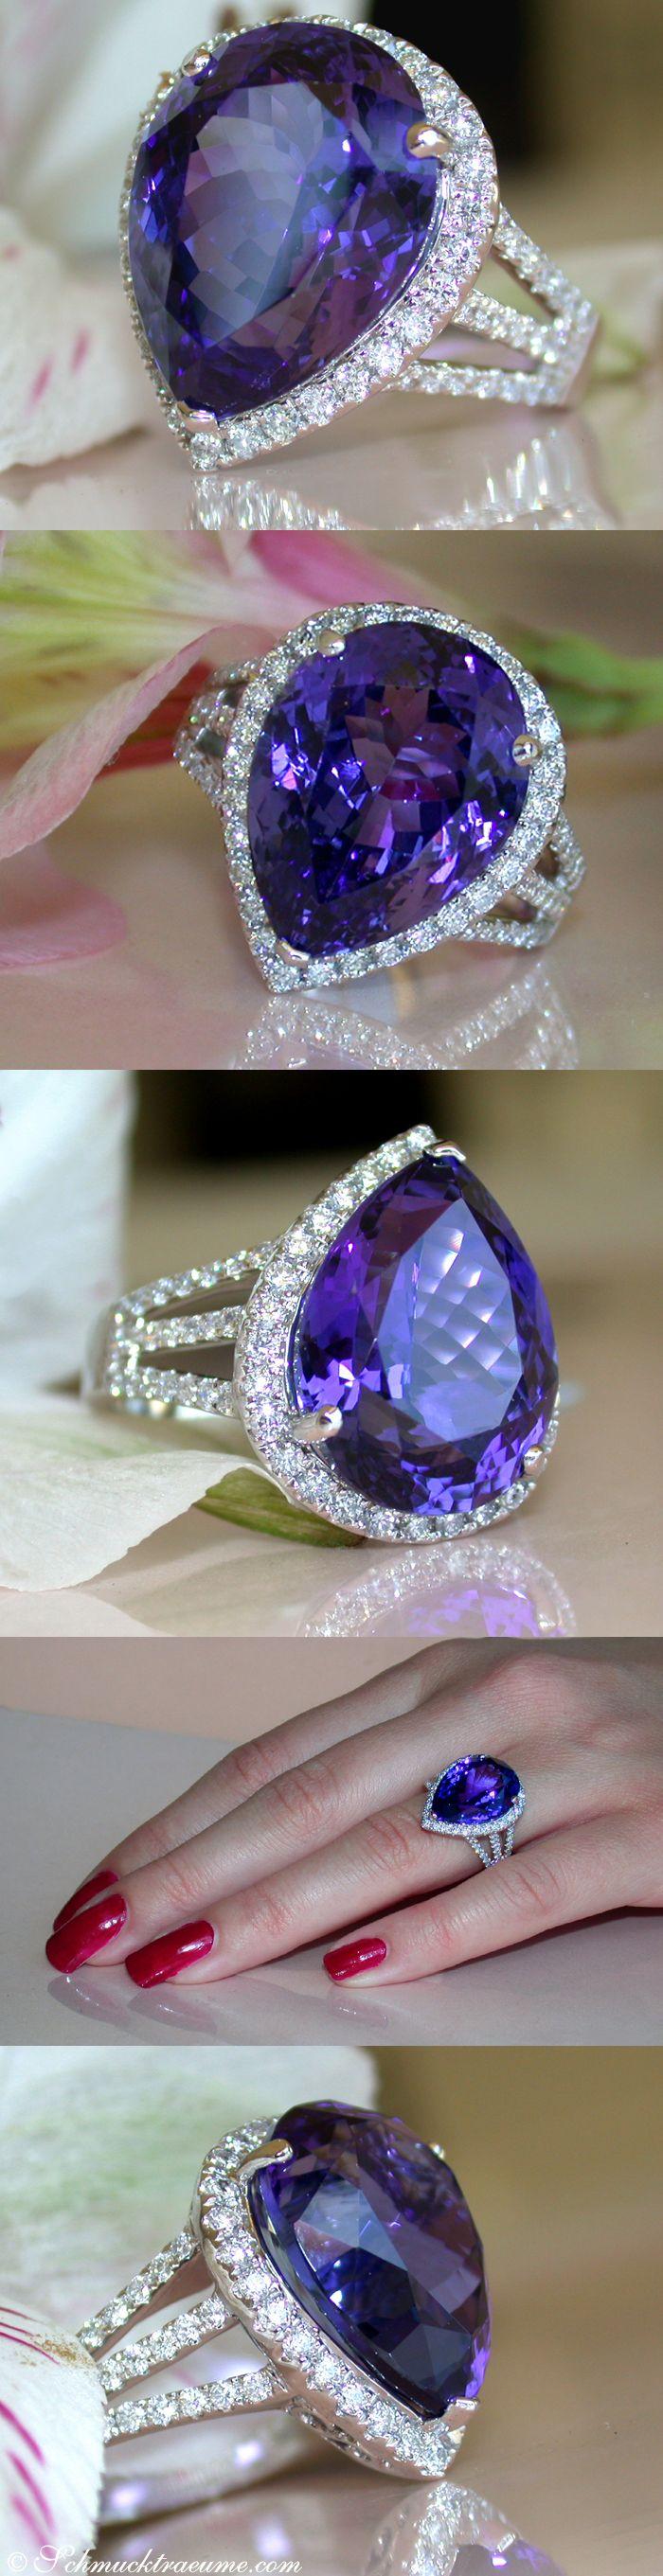 High-End: Huge Tanzanite Diamond Ring, 12,14 cts. WG-18K